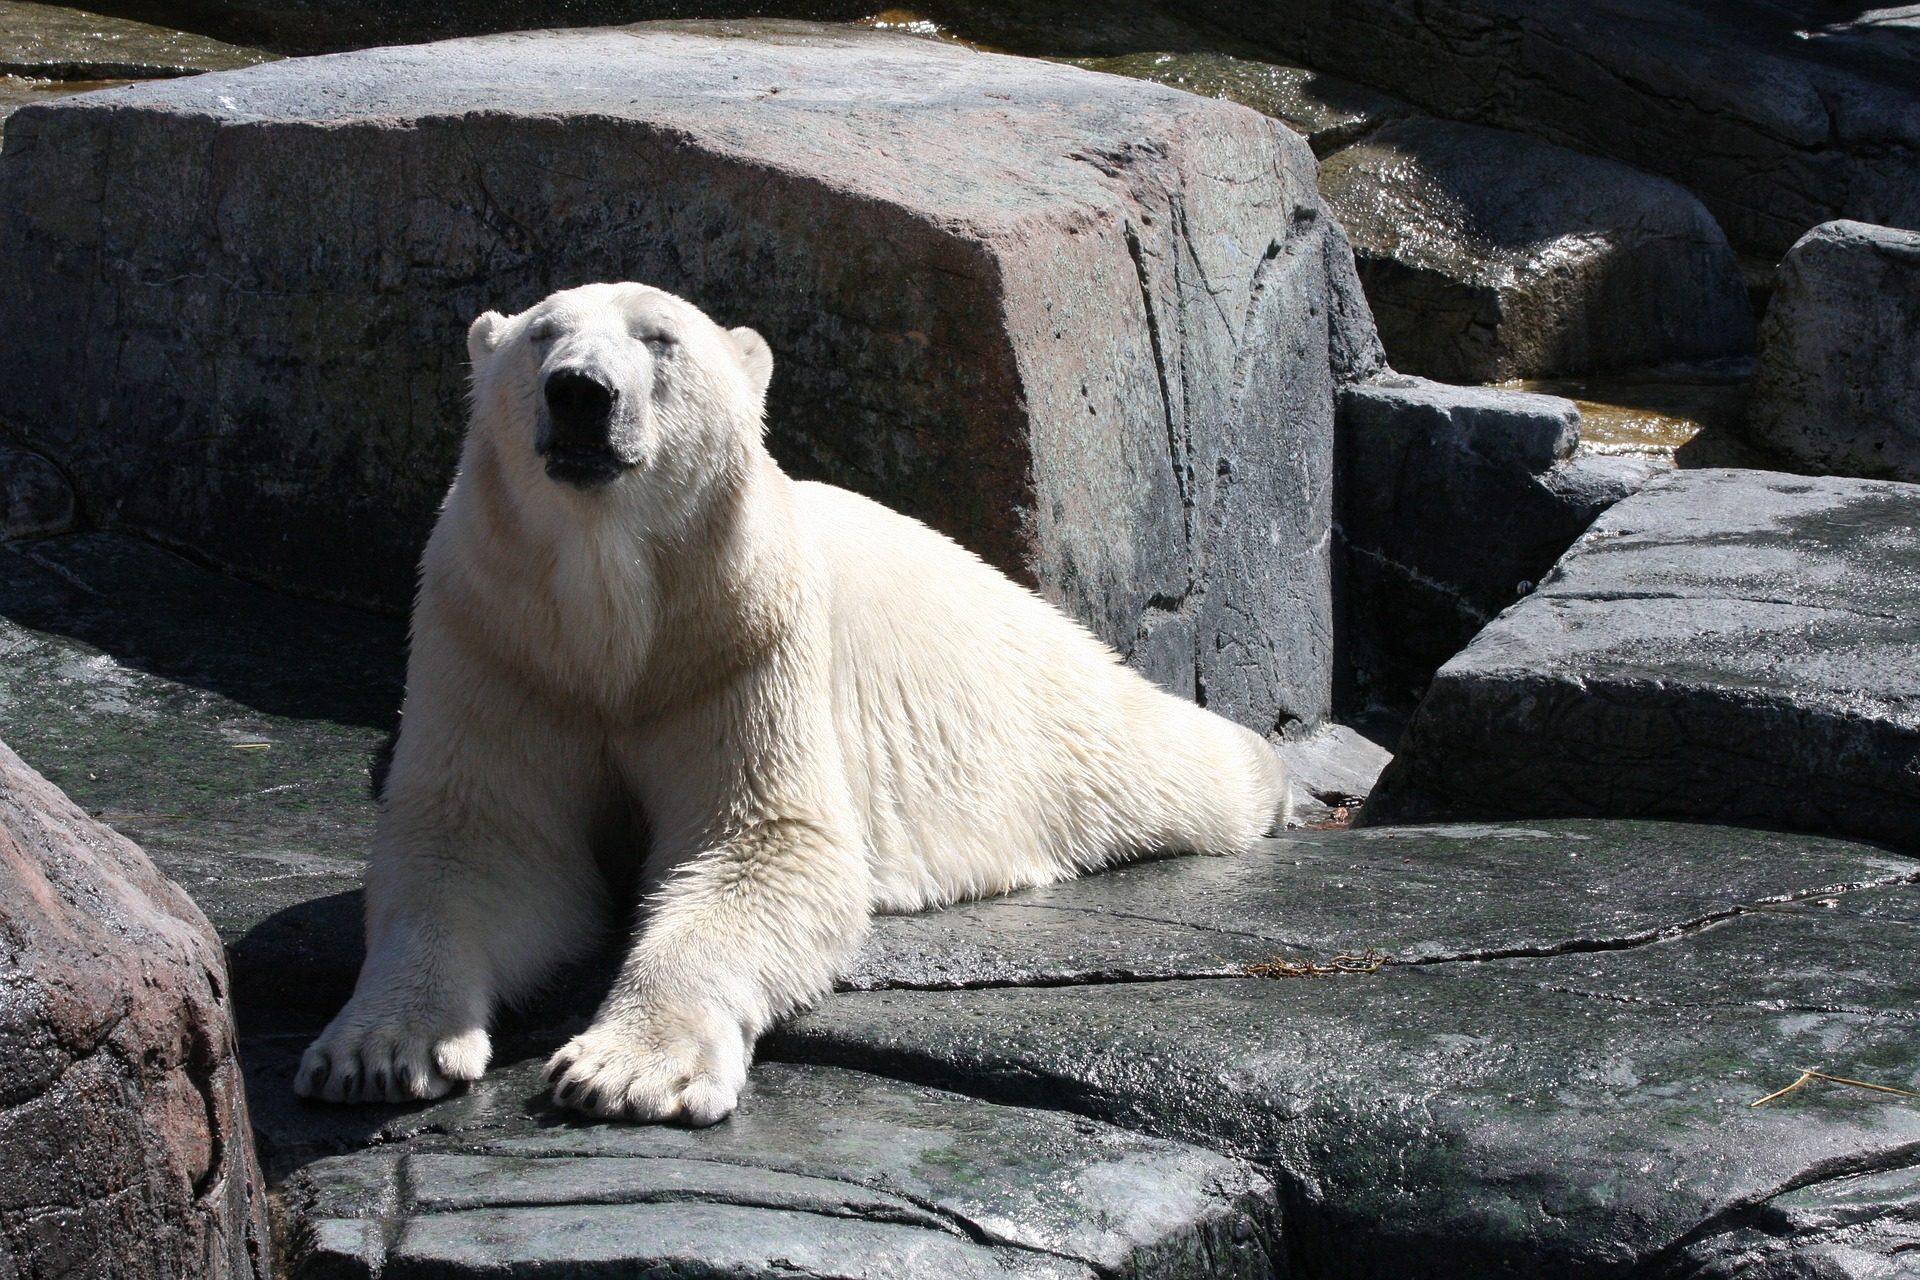 orso, Polar, Bianco, resto, pietre, acqua - Sfondi HD - Professor-falken.com